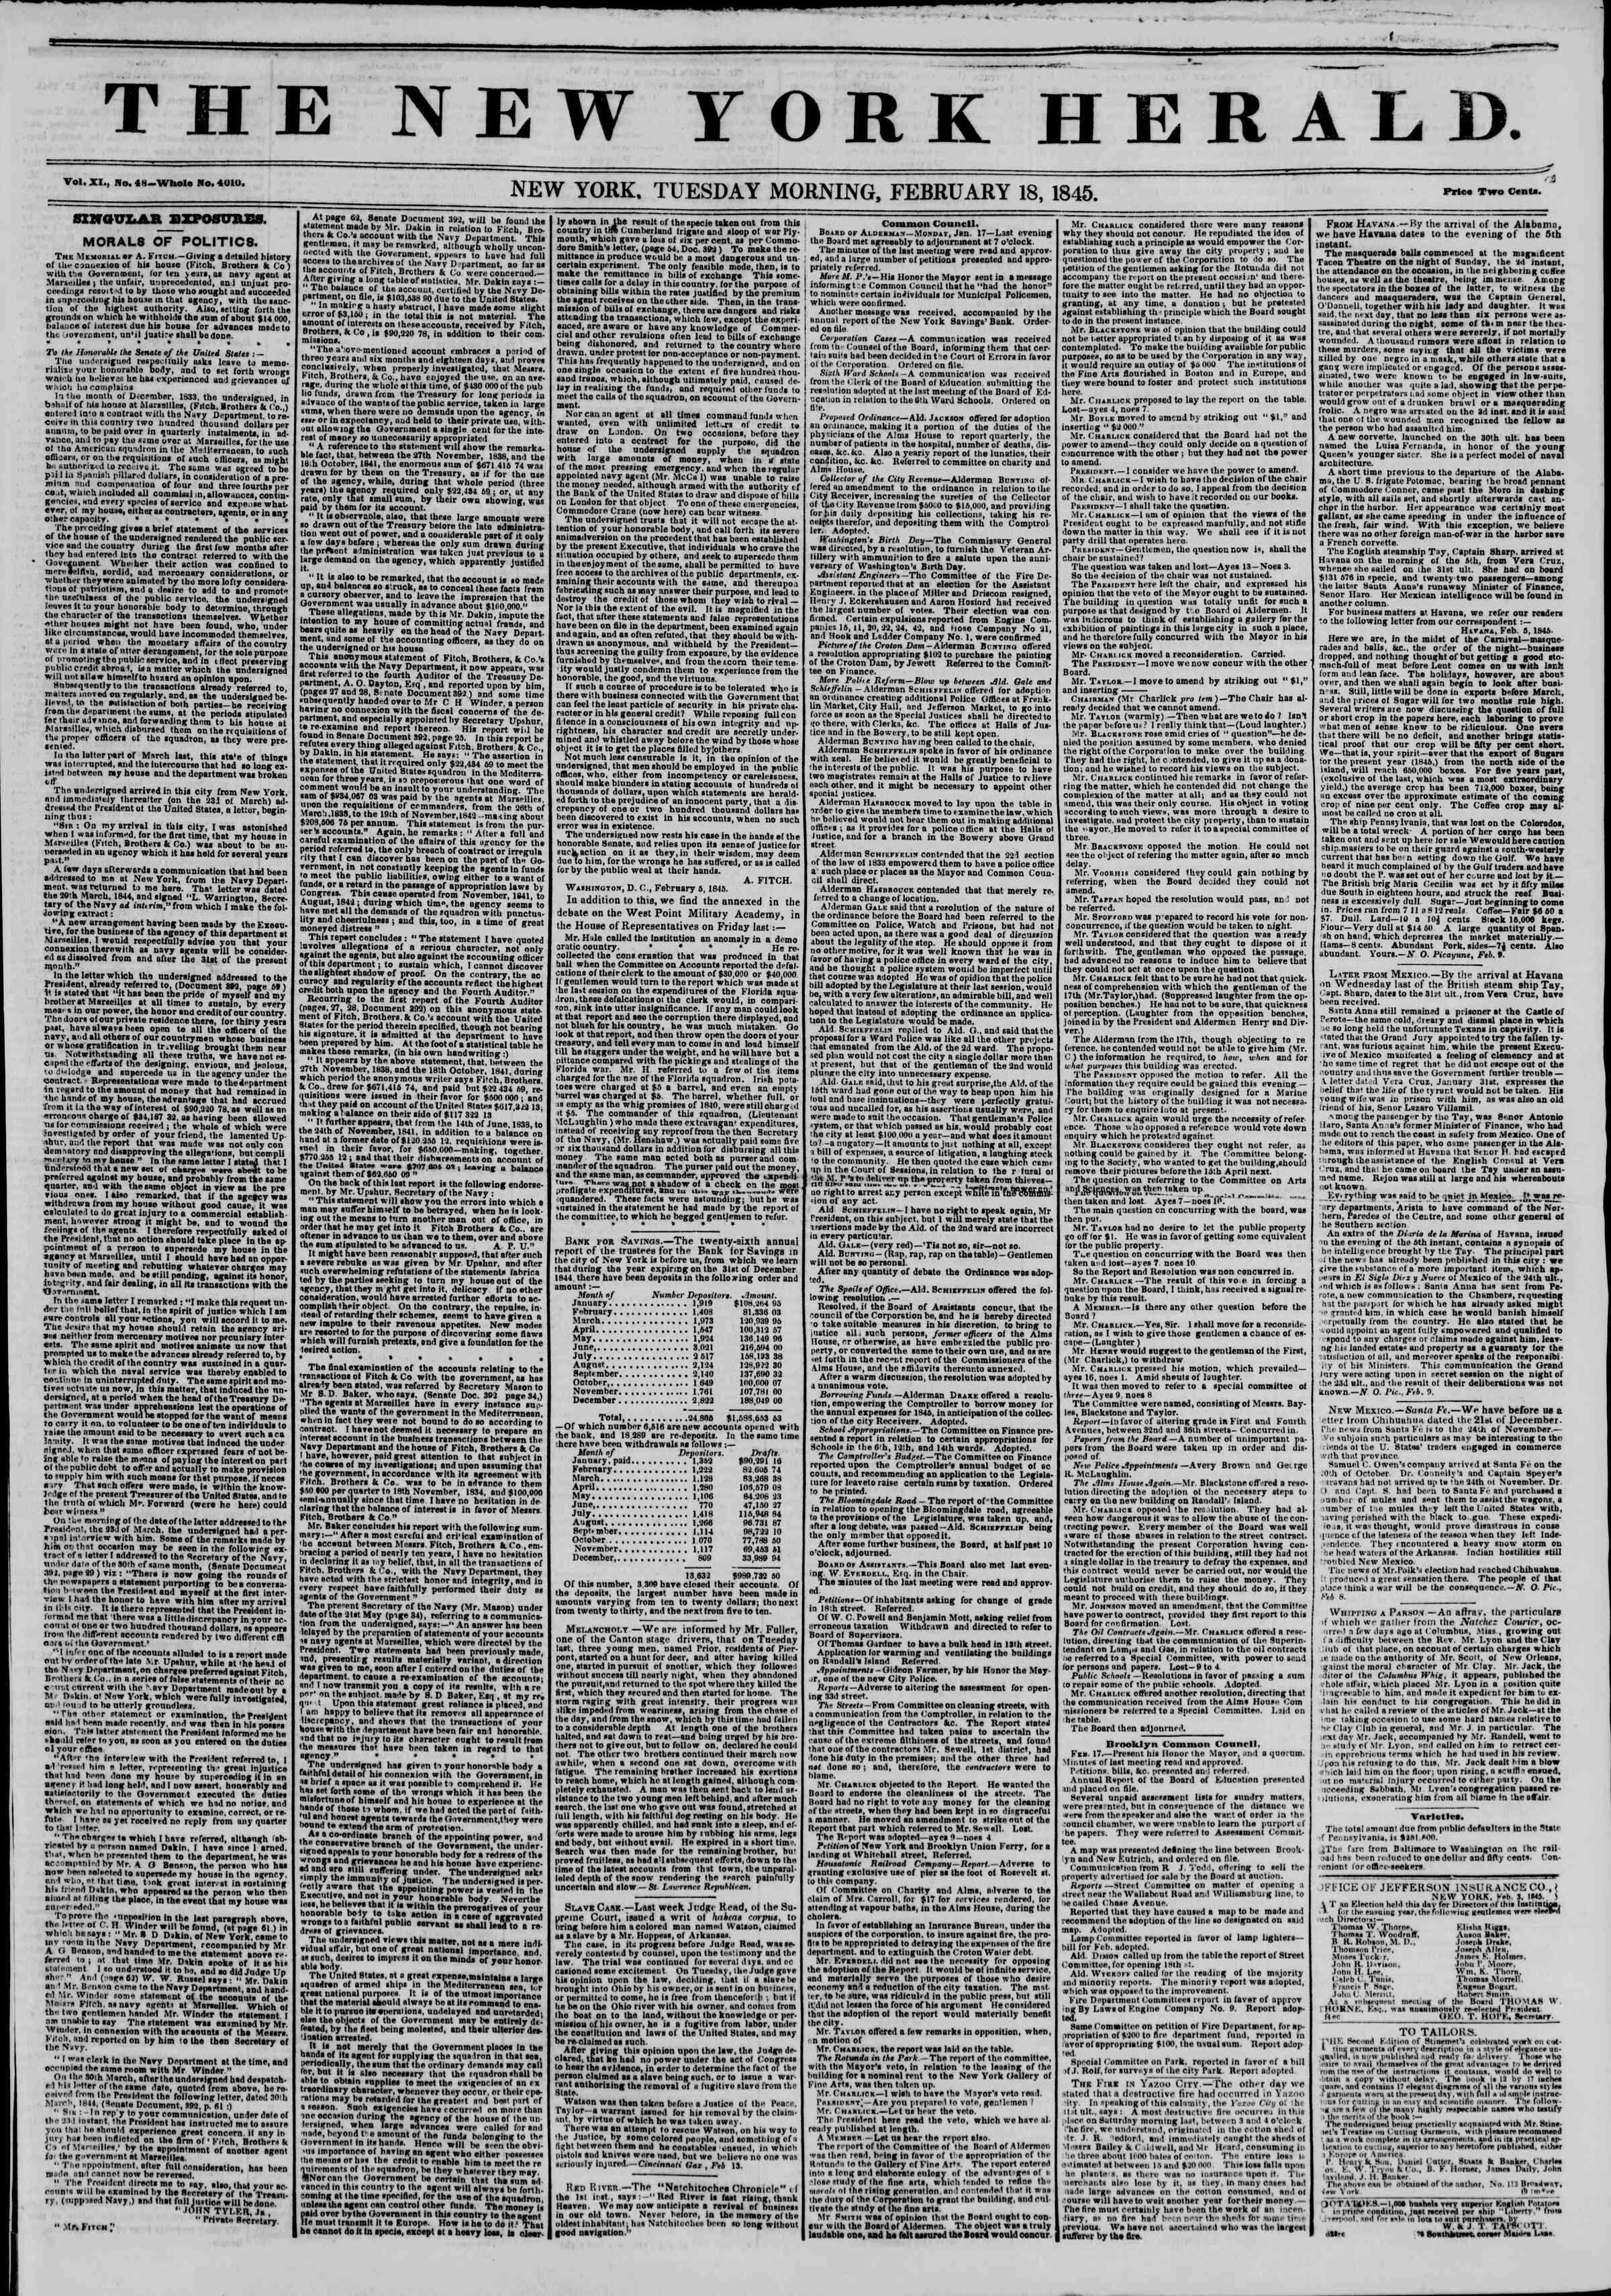 February 18, 1845 Tarihli The New York Herald Gazetesi Sayfa 1